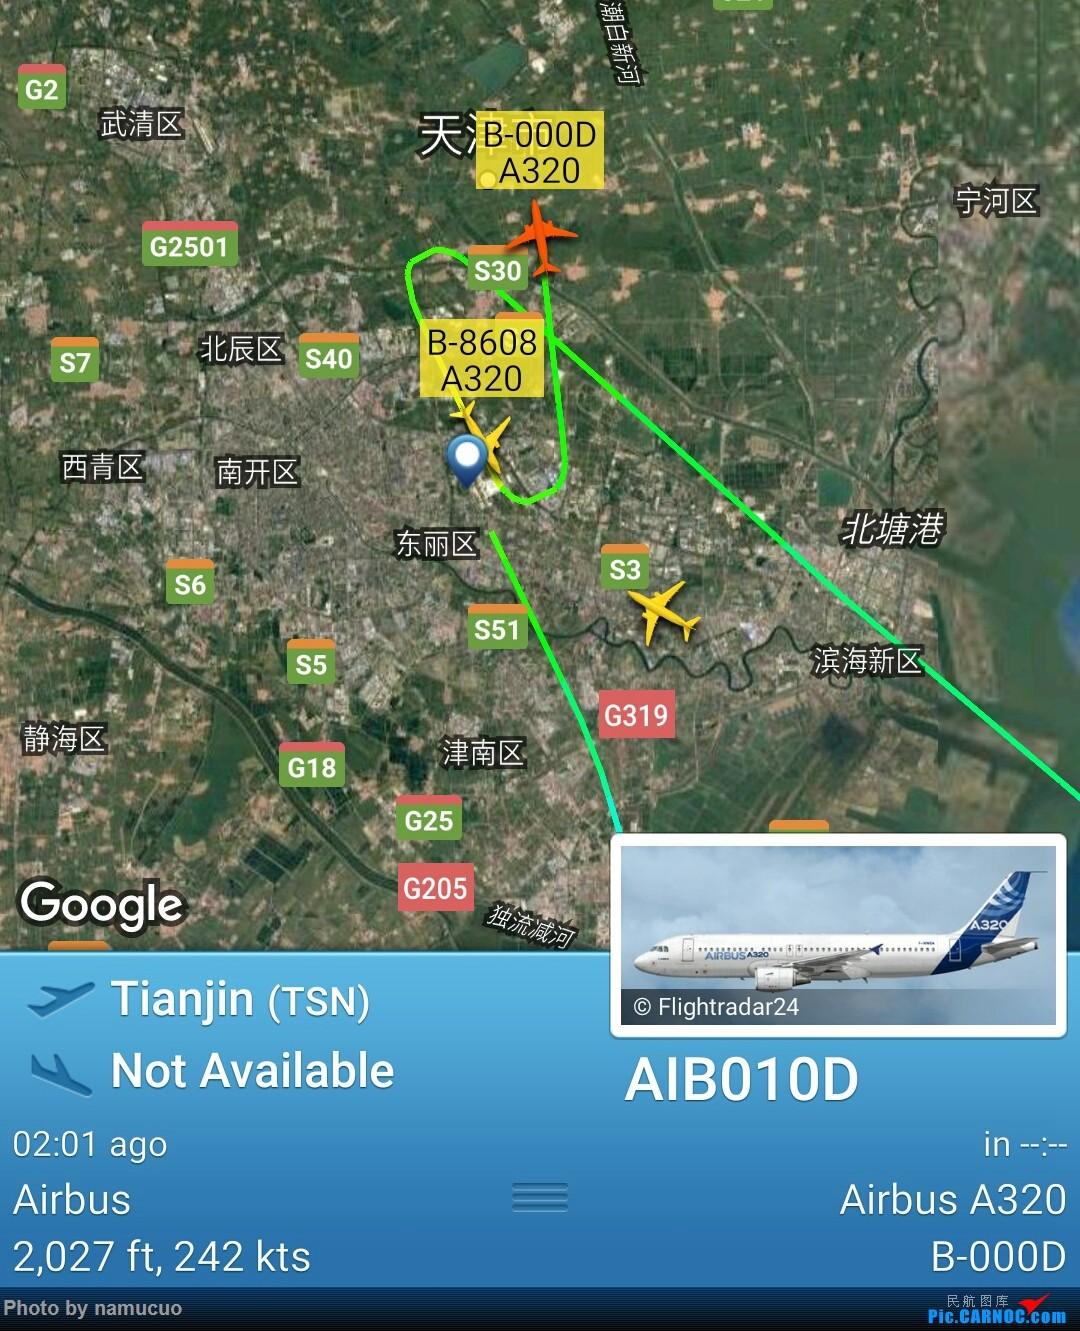 Re:[原创]【TSN】B-000D试飞,快降落时又突然加速拉起